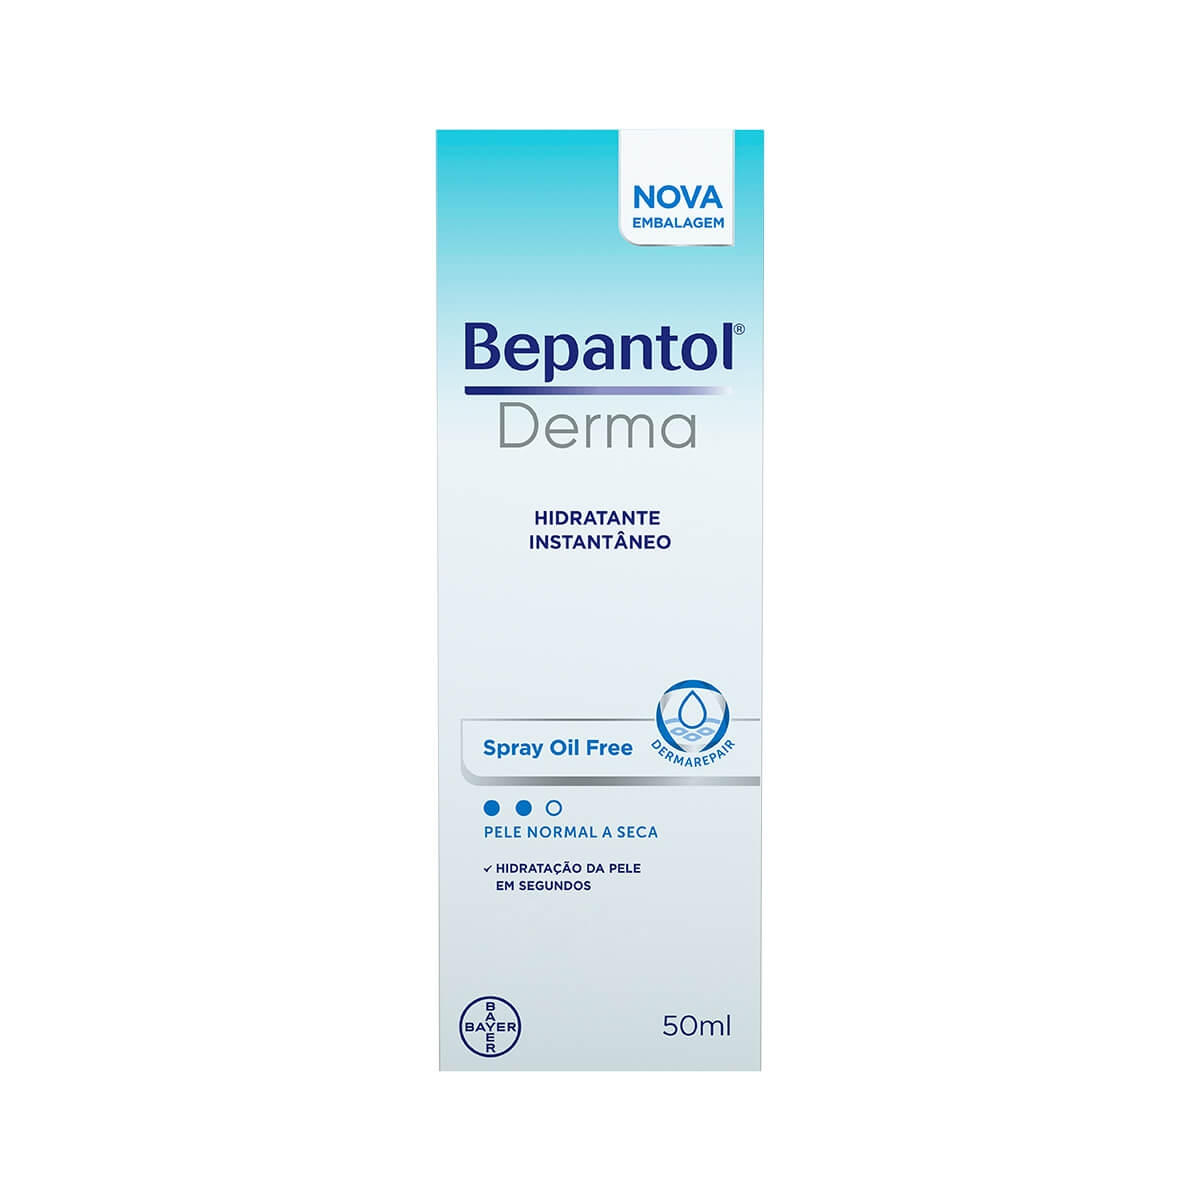 Bepantol Derma Spray Hidratante com 50ml 50ml